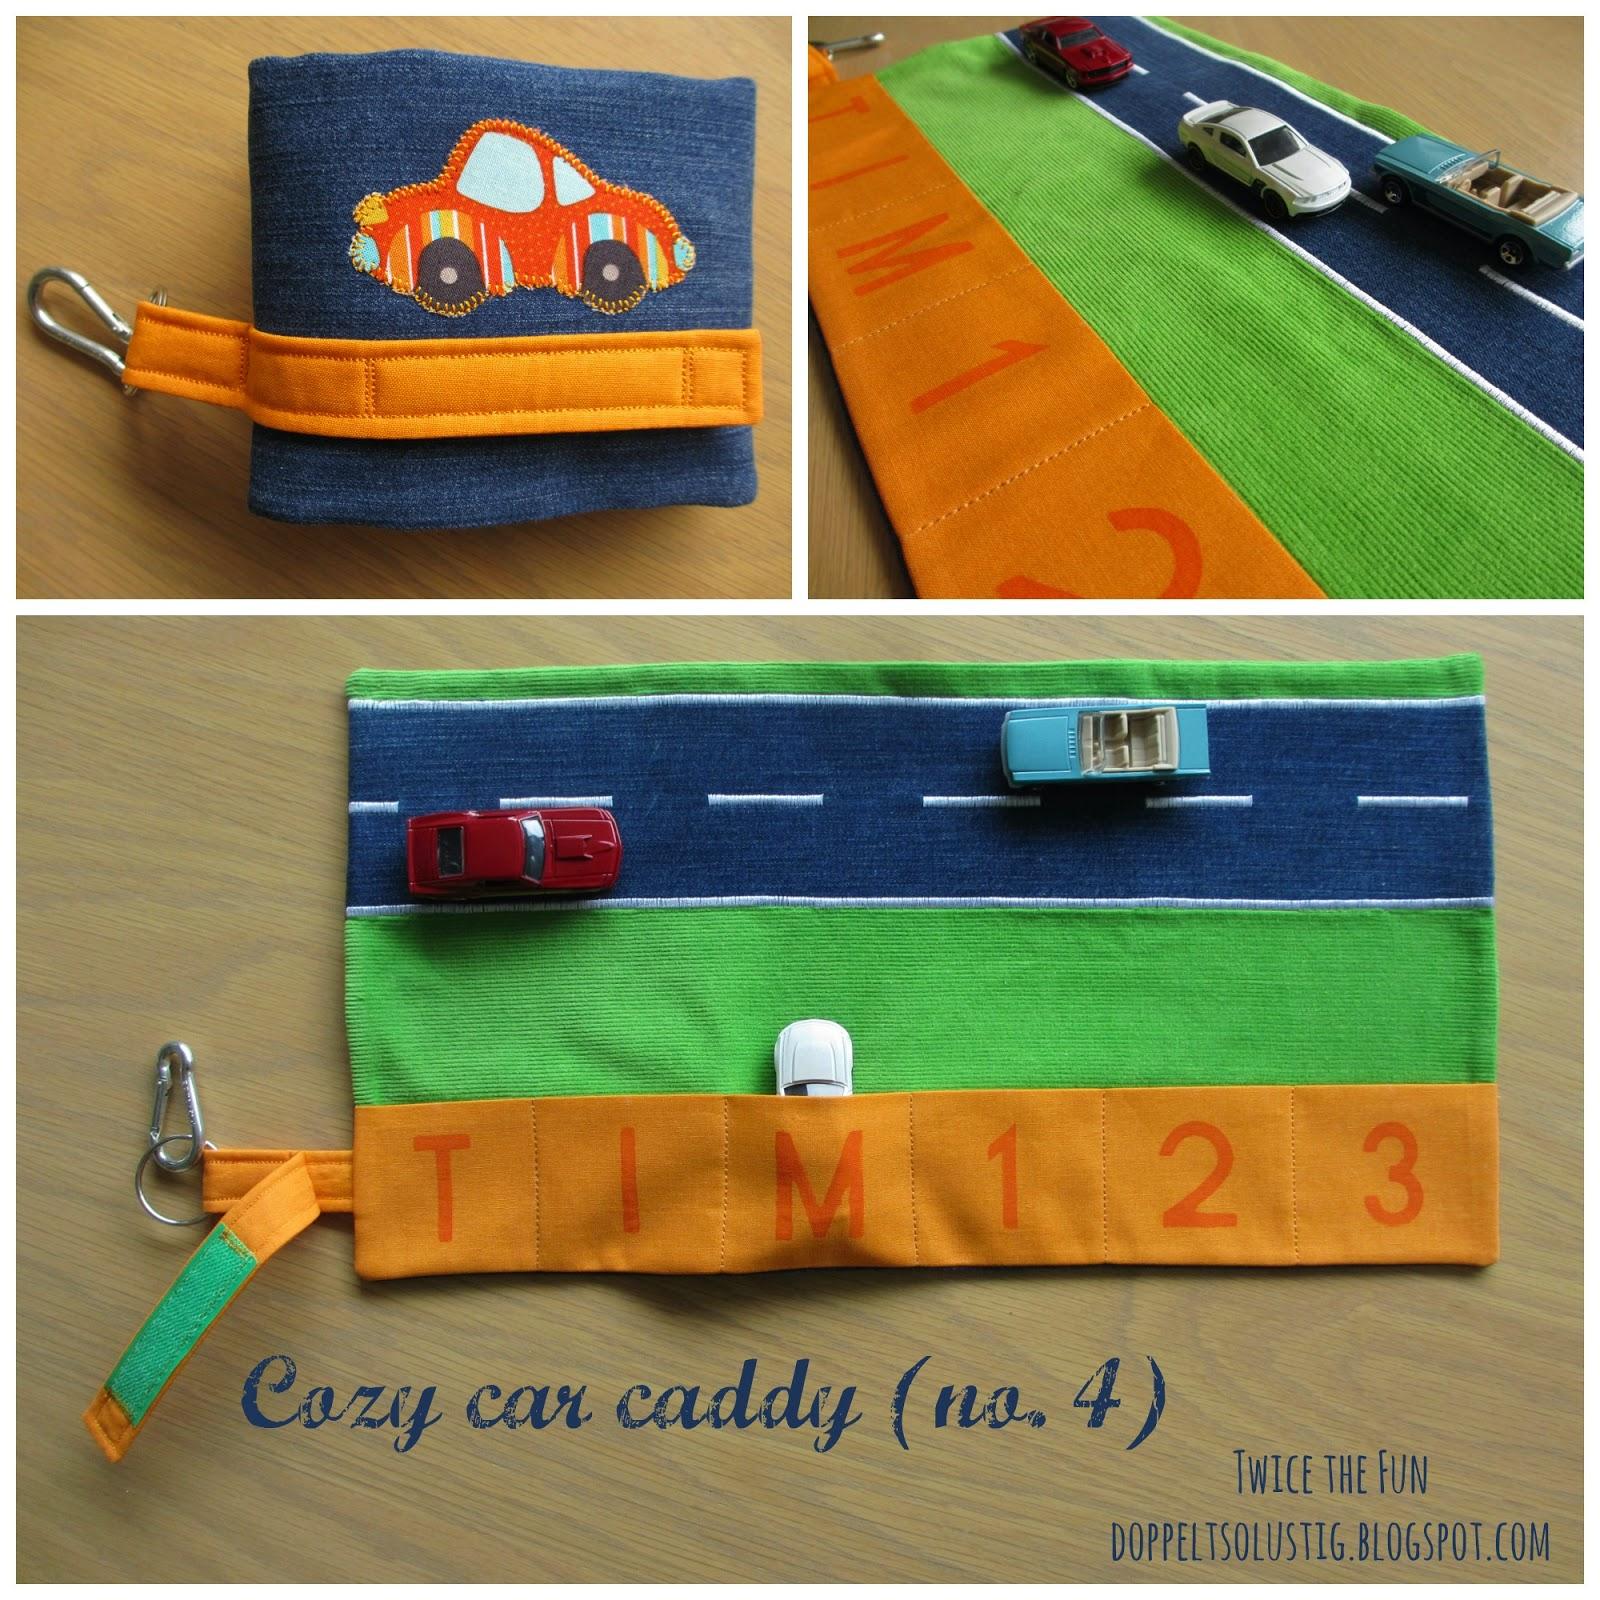 Cozy car caddy no. 4 | Twice the fun